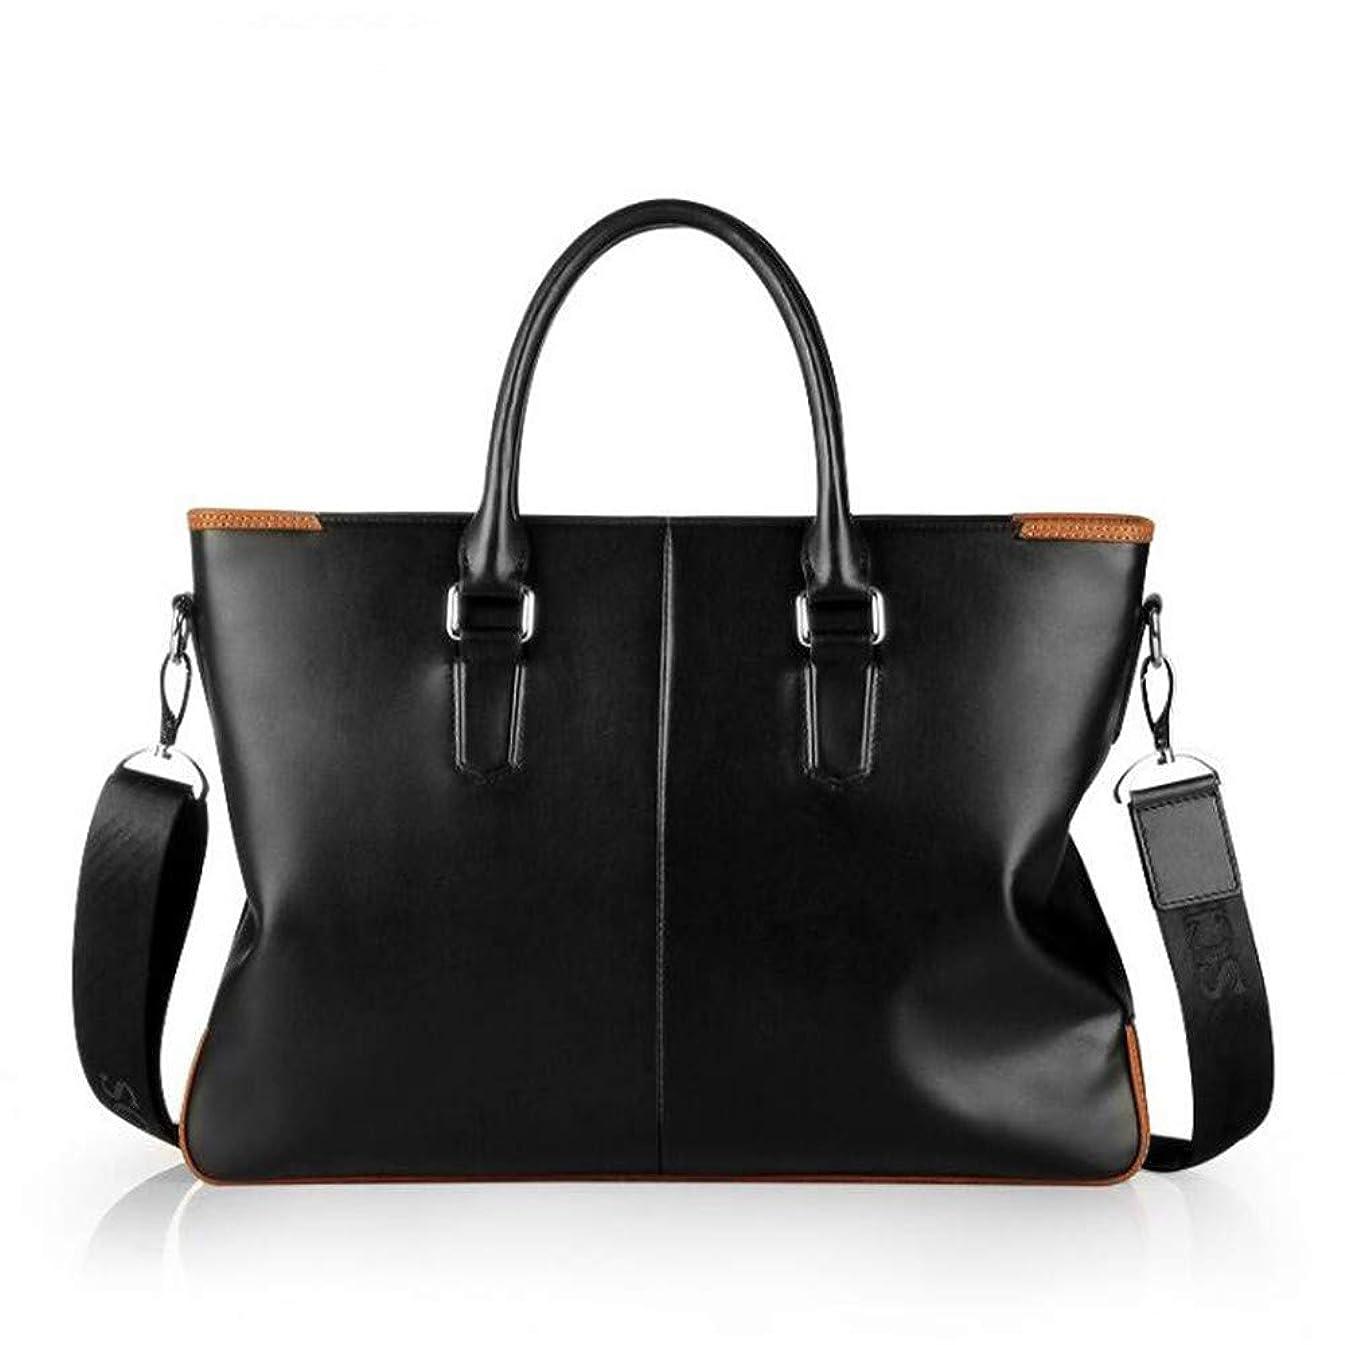 Liweibao Messenger Bag Mens Leather Briefcases Laptop Business Office Shoulder Handbags Messenger Bag Perfect for College Business